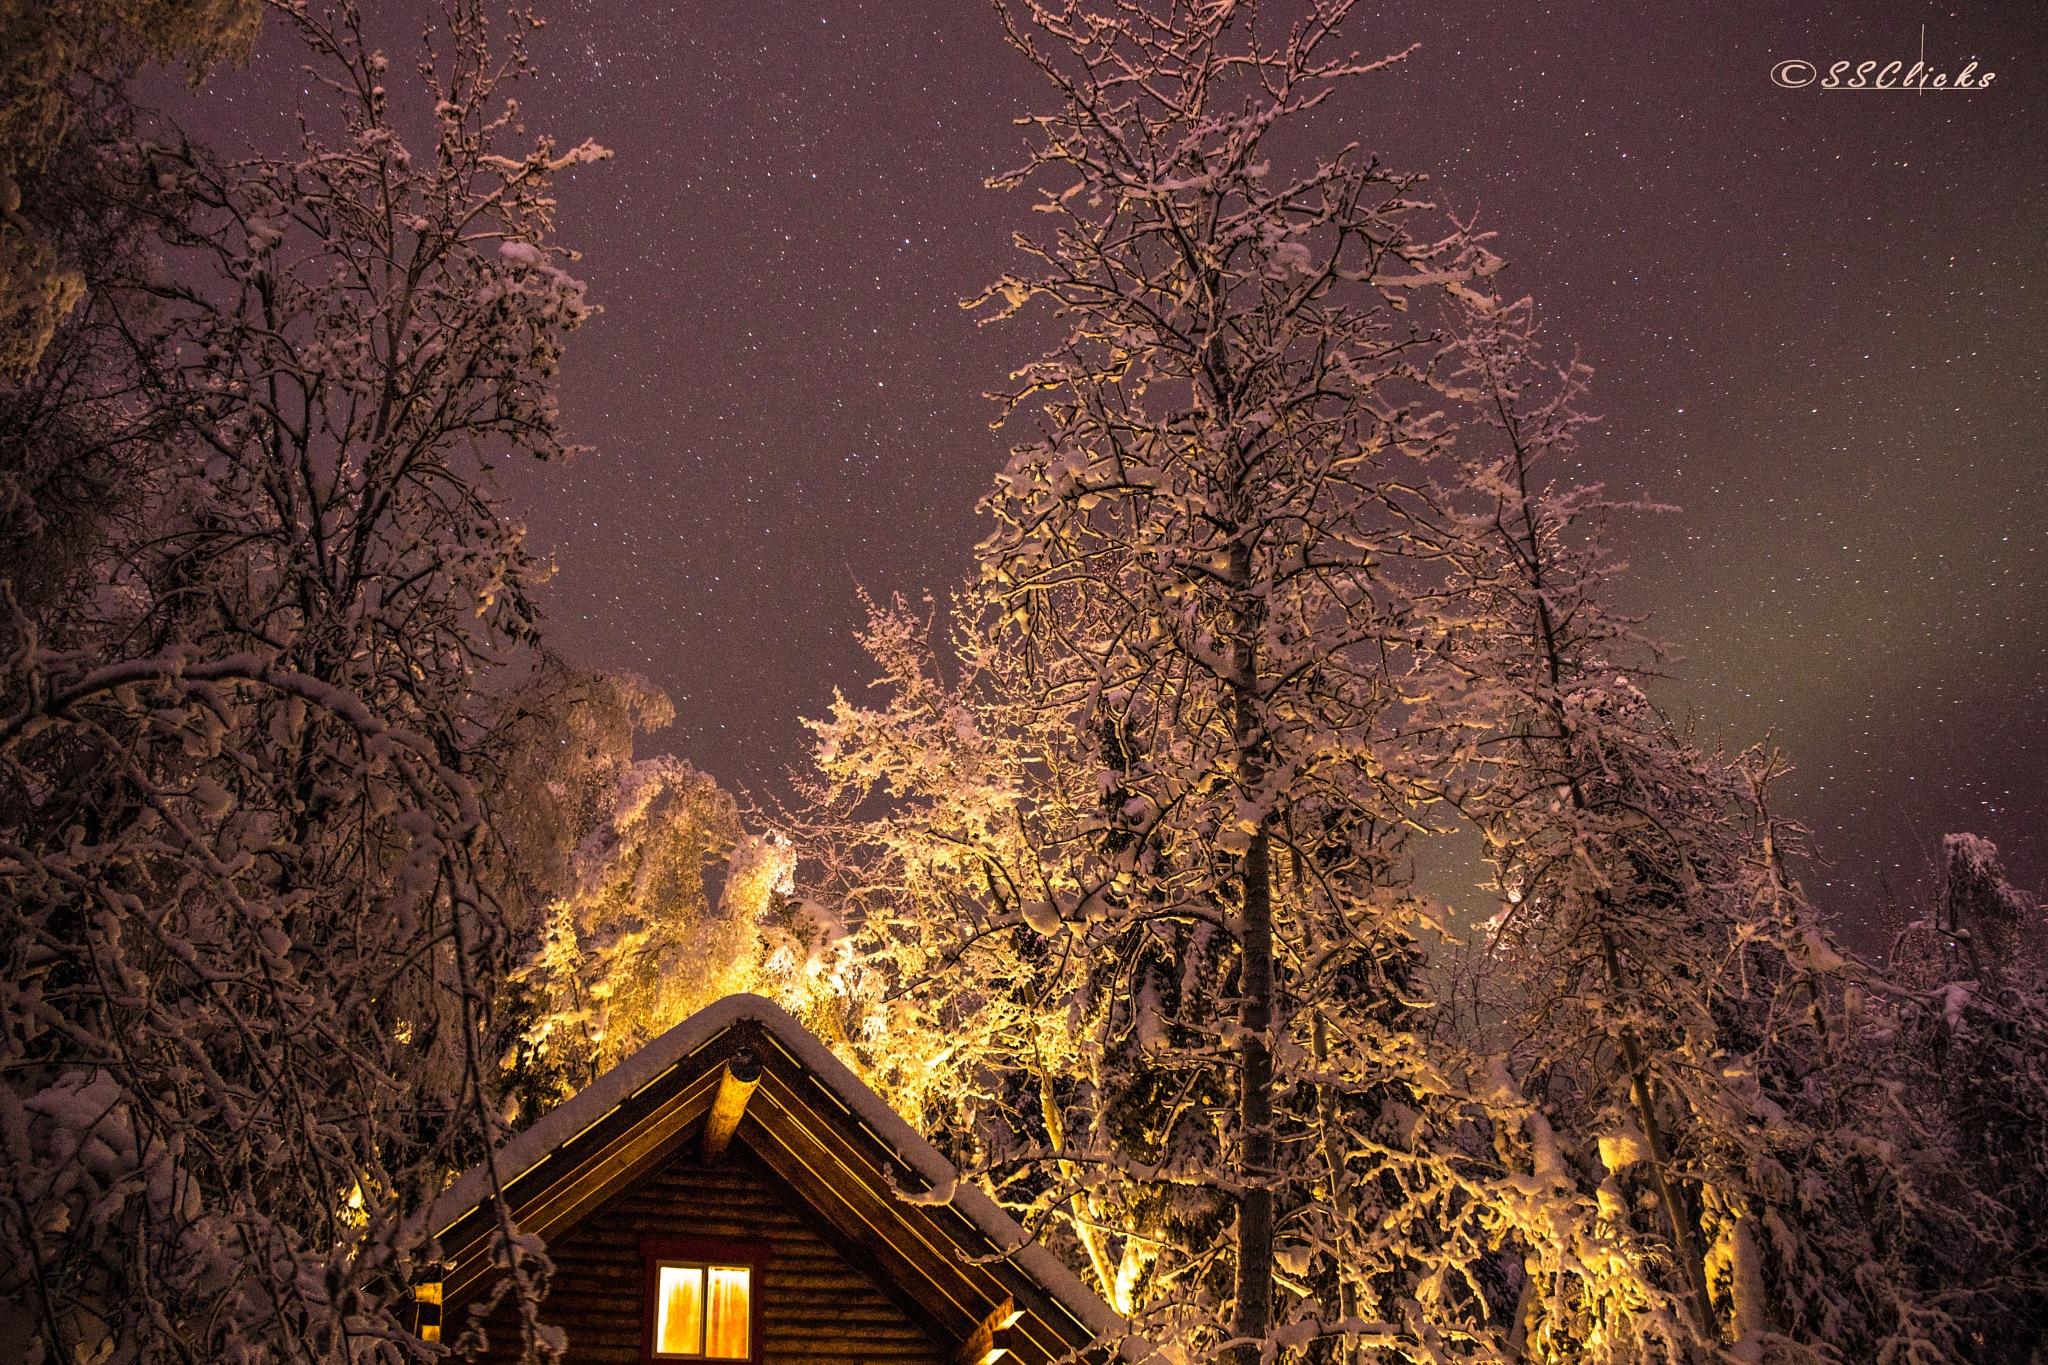 Stars and cabin by Sriram Areti